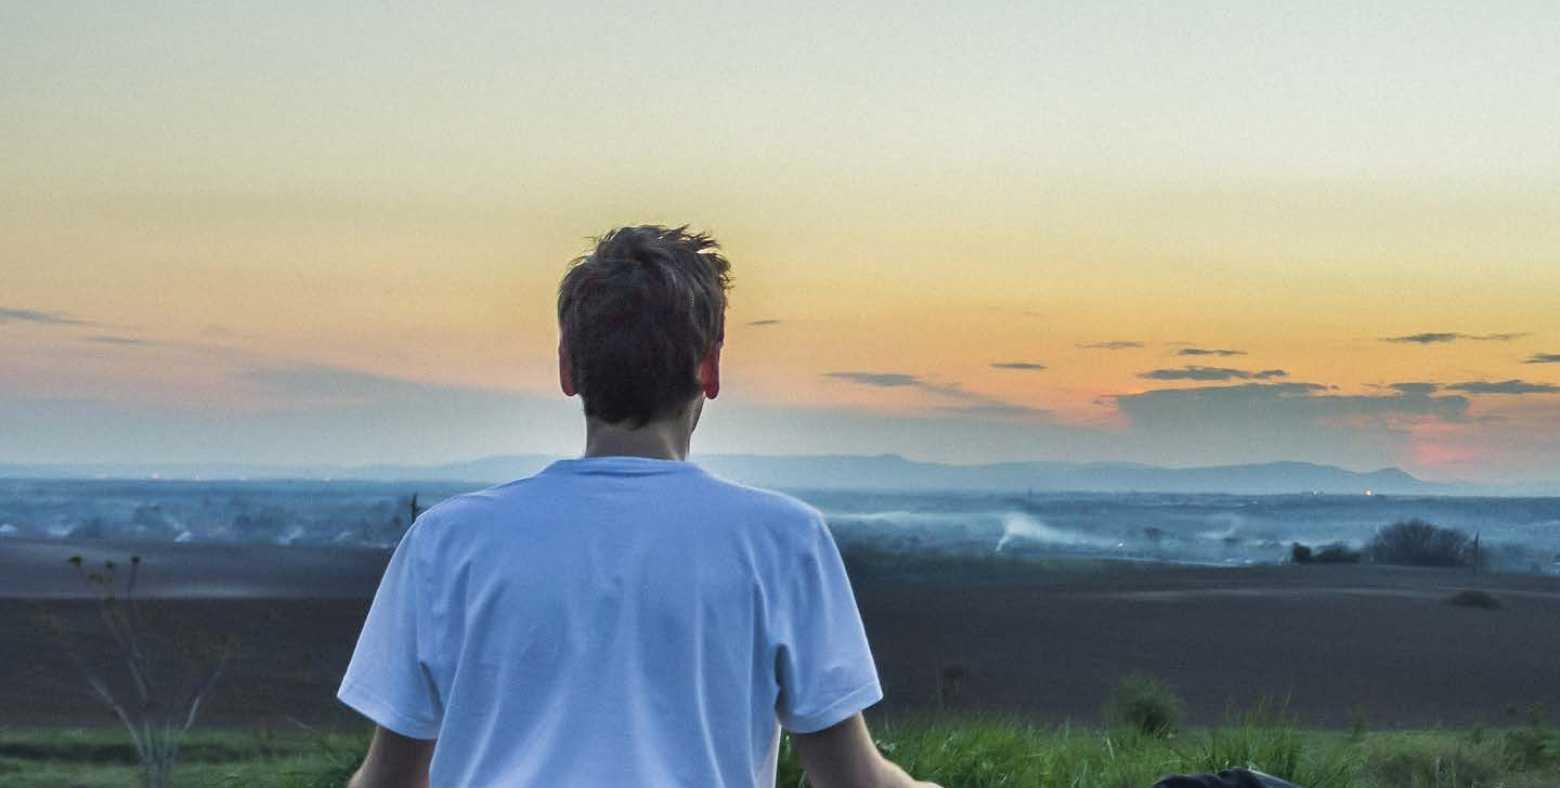 man meditating in front of ocean